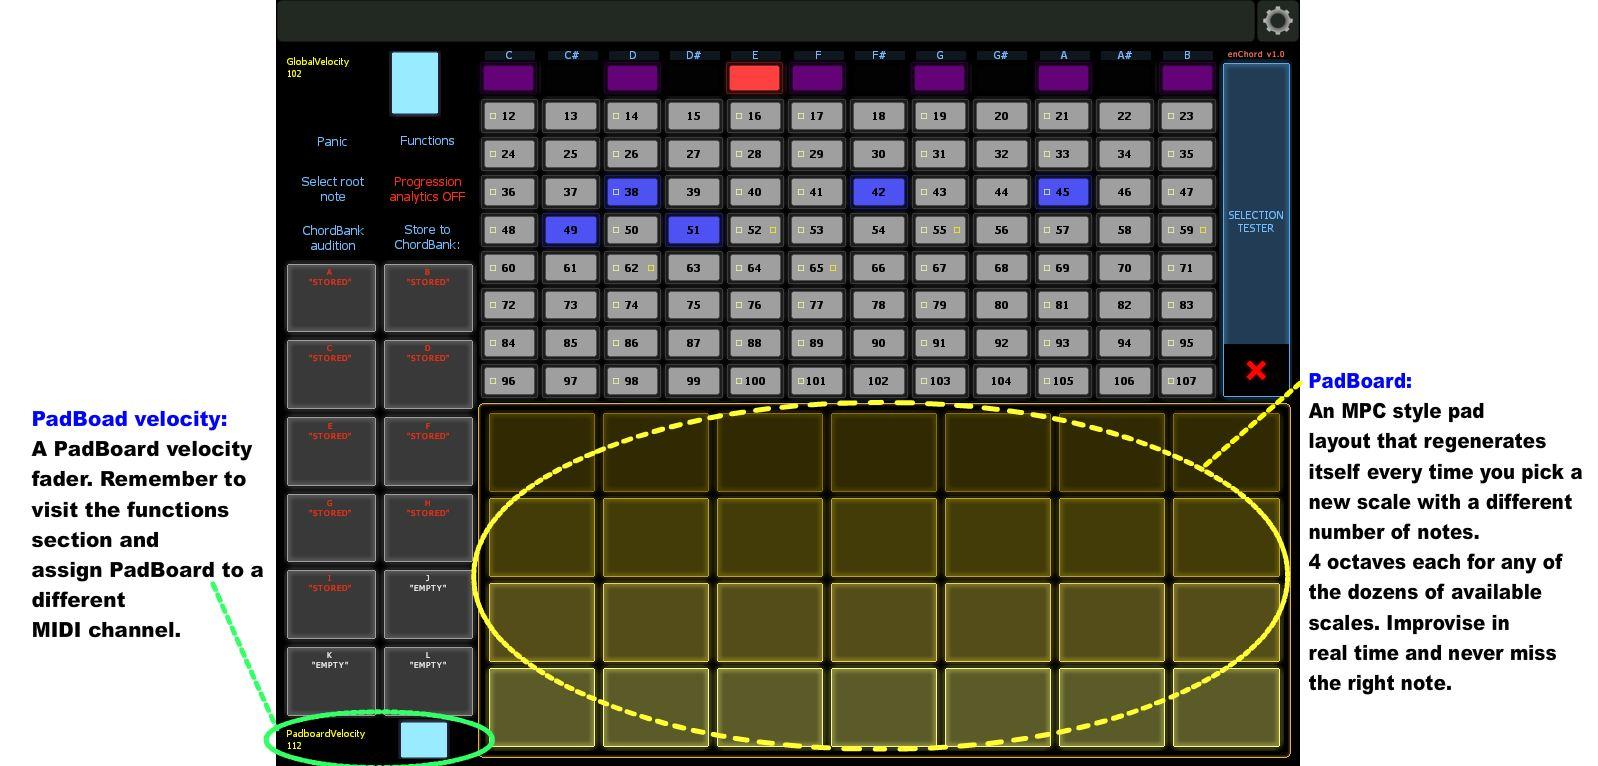 Chord progression generator or tips page 9 gearslutz pro httpsgearslutzboardattacposition 6g hexwebz Image collections